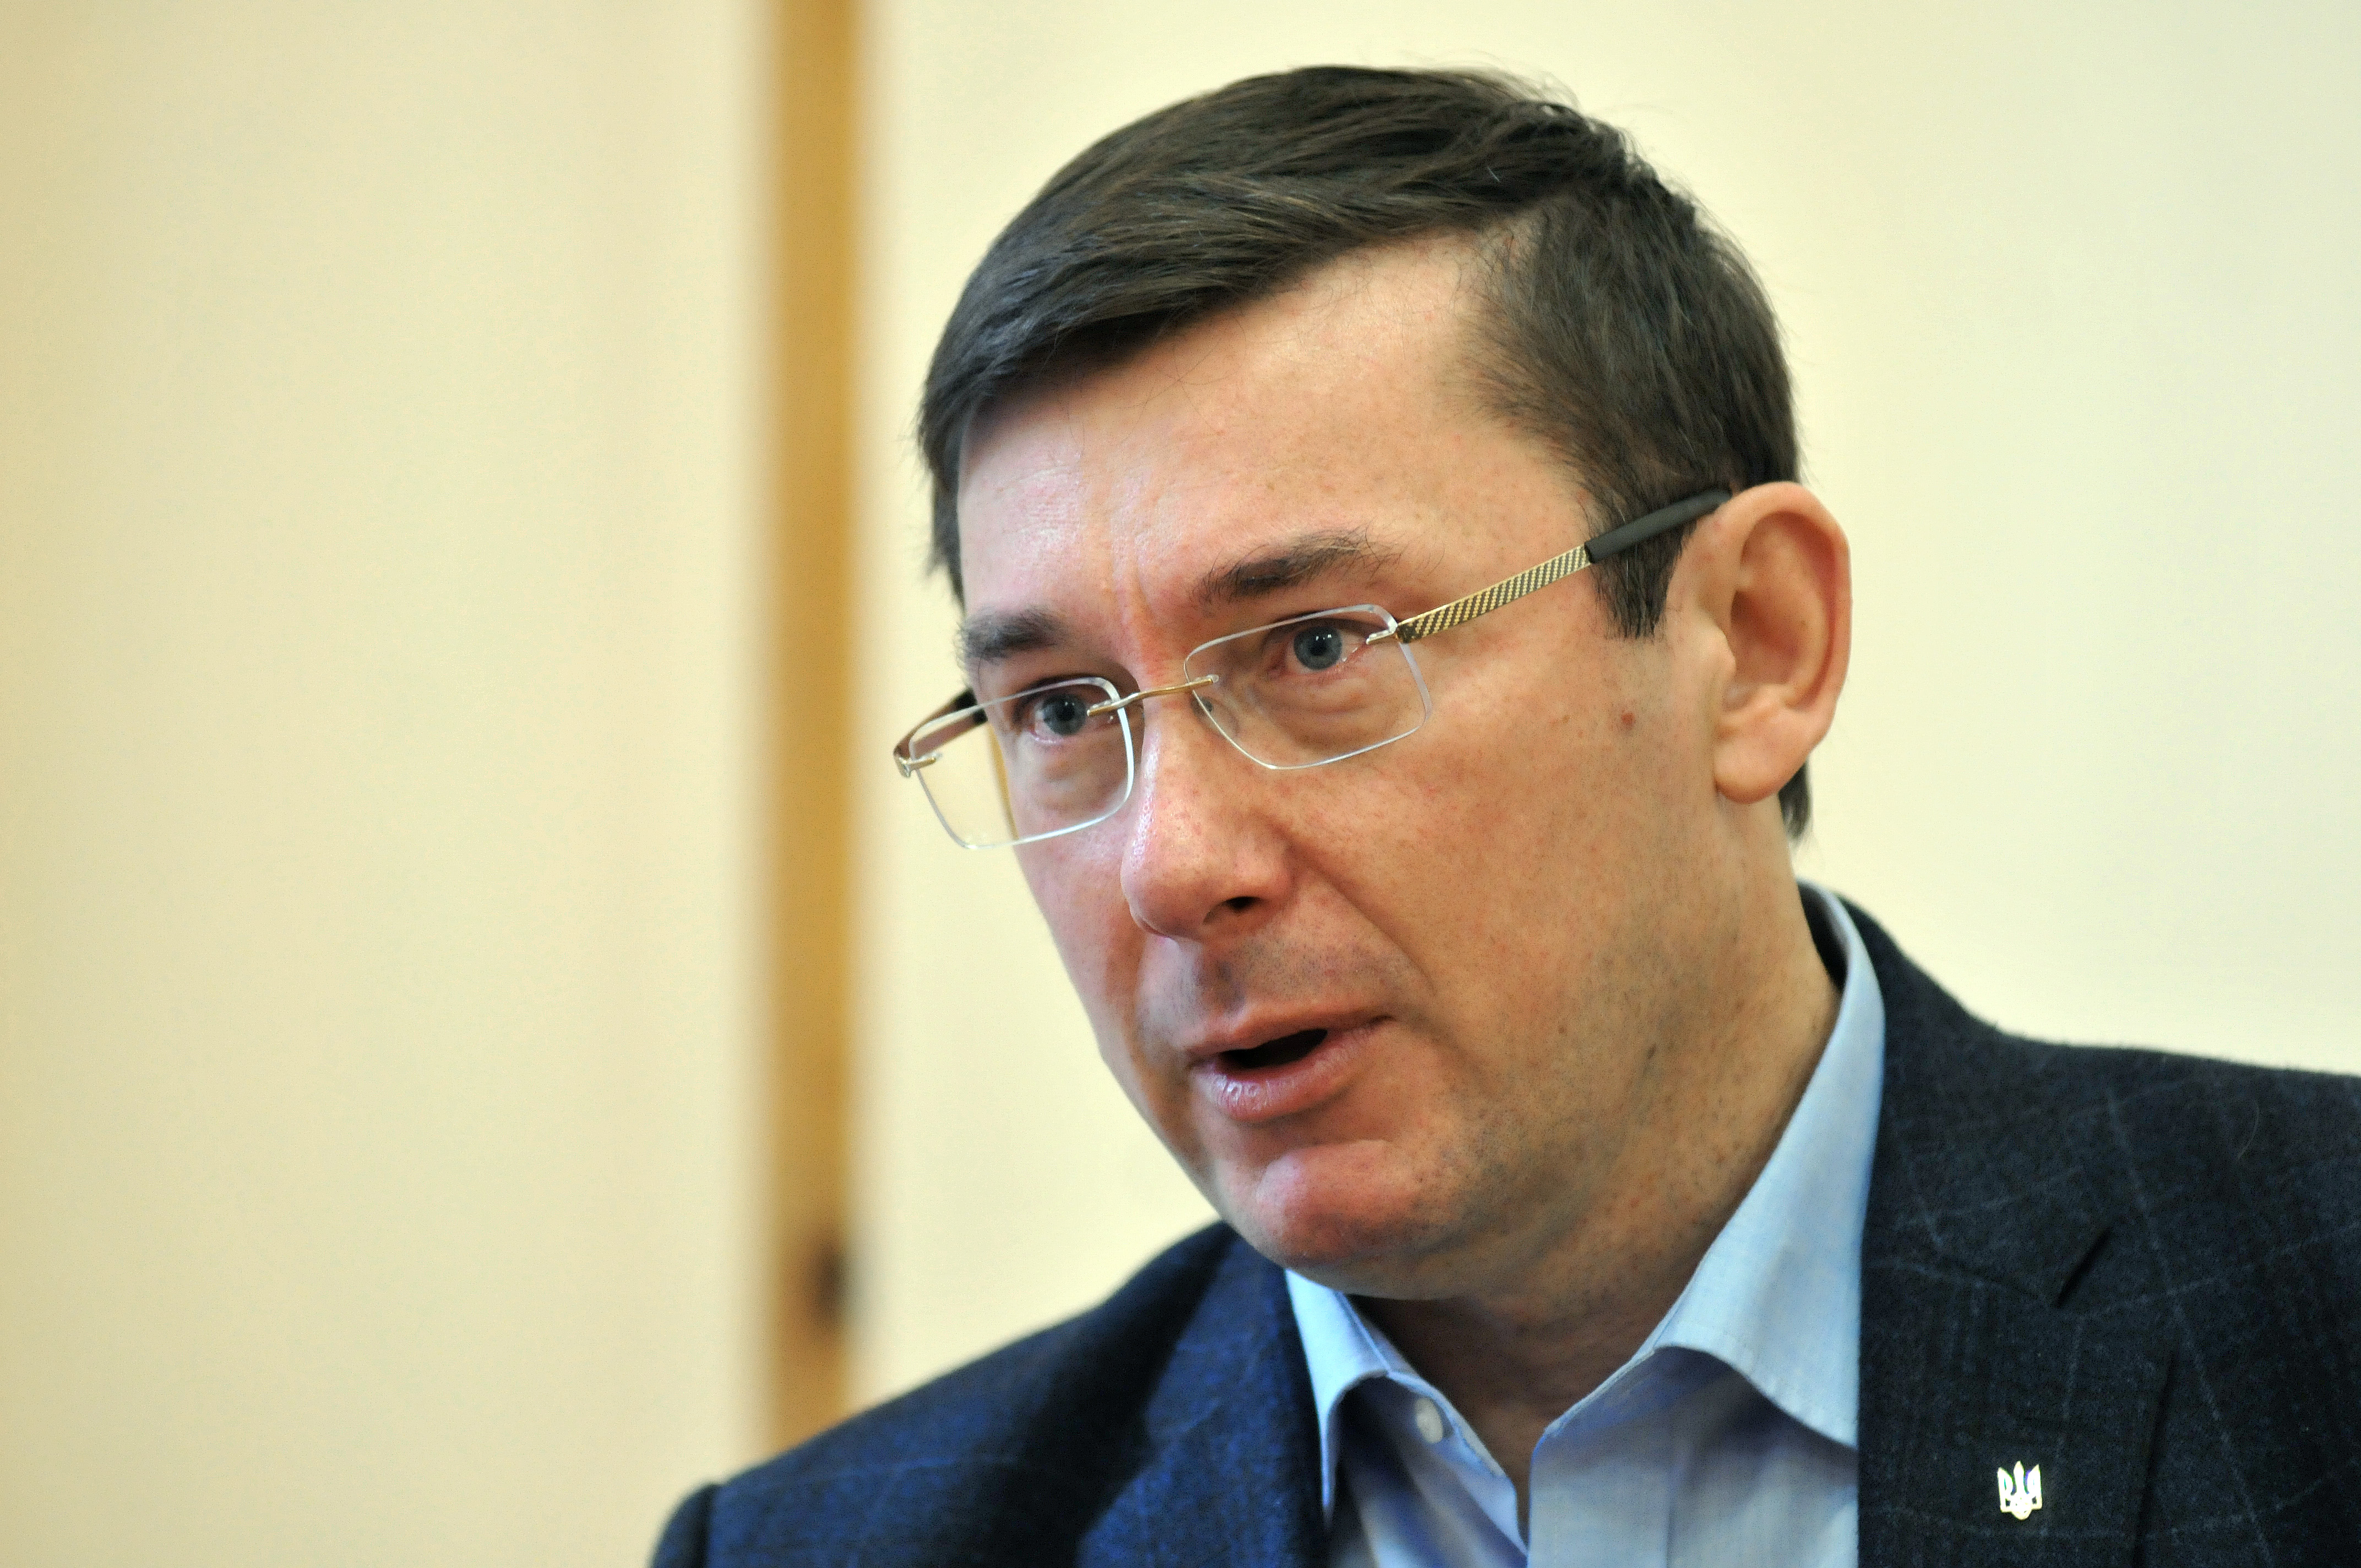 Луценко оформив будинок на підставну особу – Лещенко